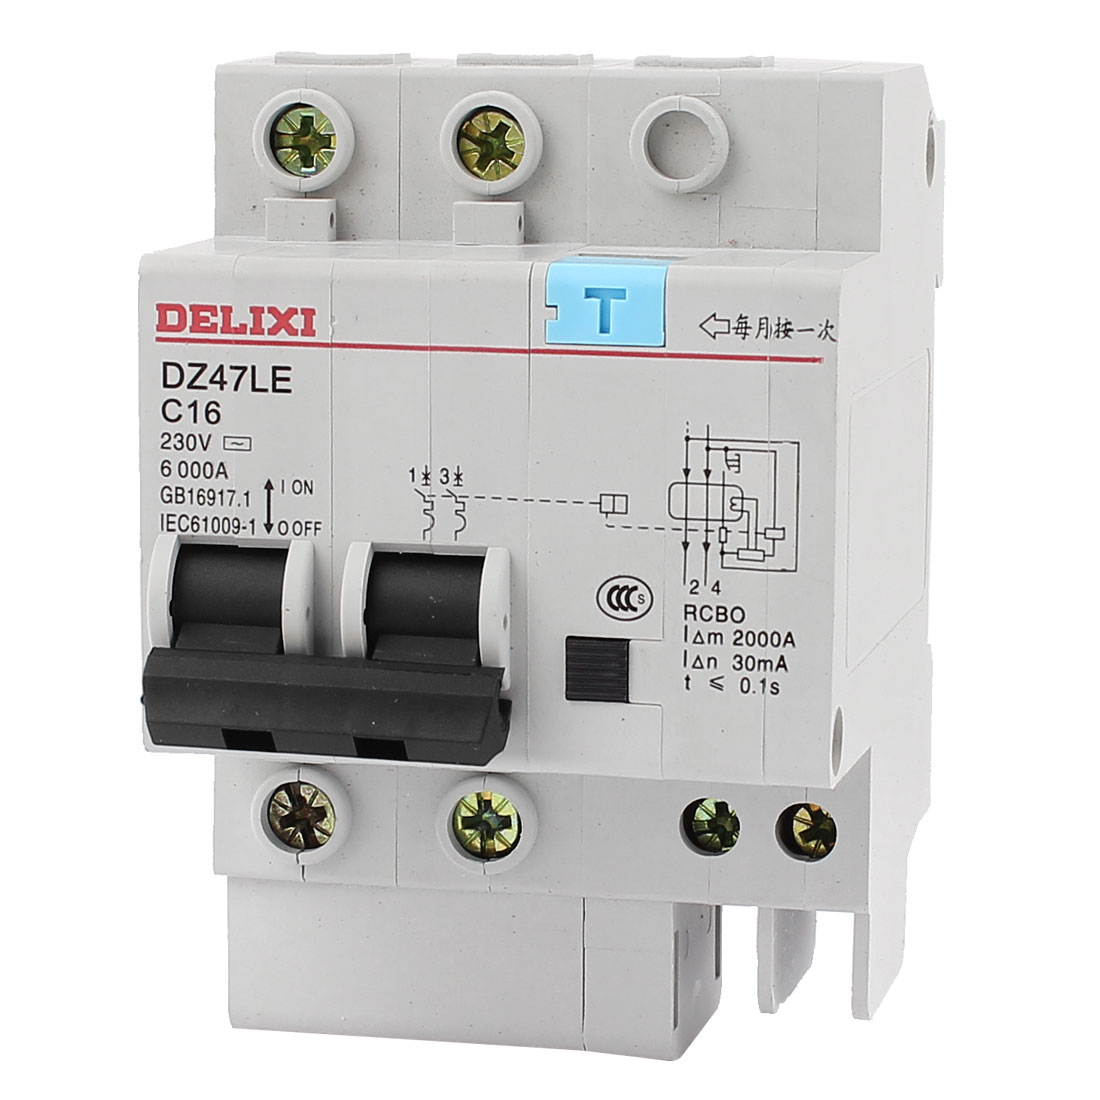 AC 230V 16A 6000A 2 Poles DIN Rail Mount Miniature Circuit Breaker 2P